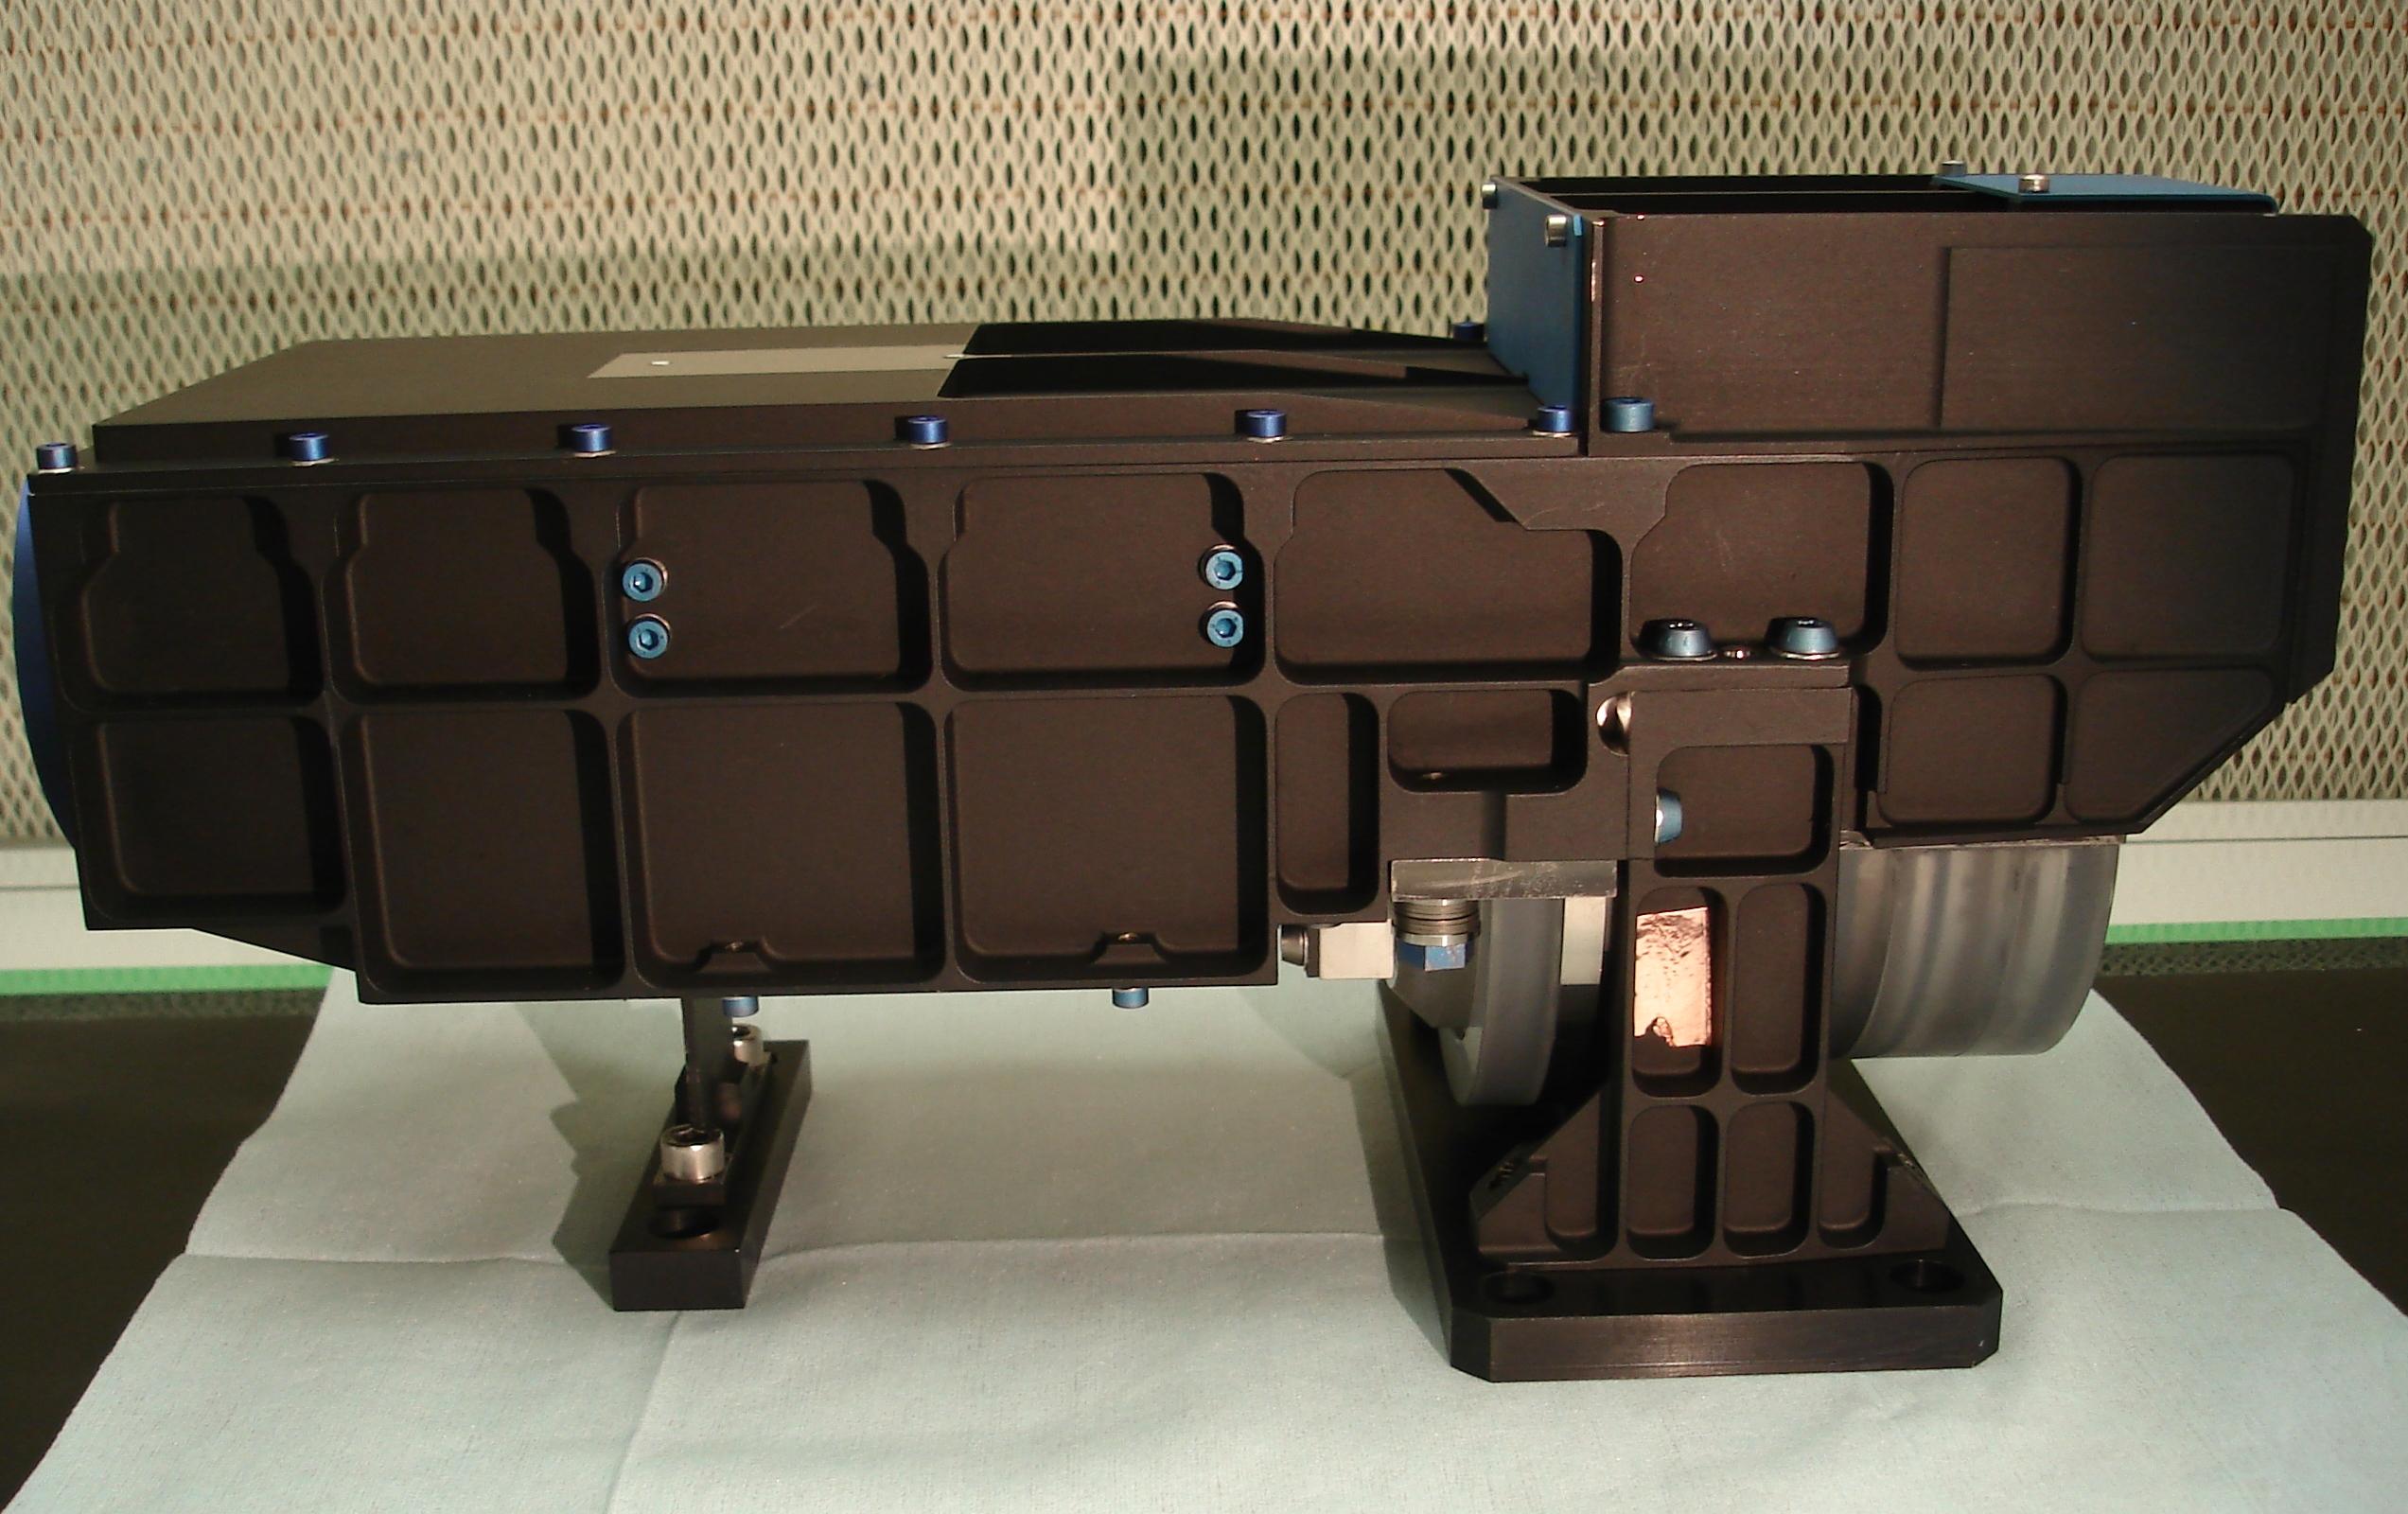 OLCI instrument. Credit: ESA